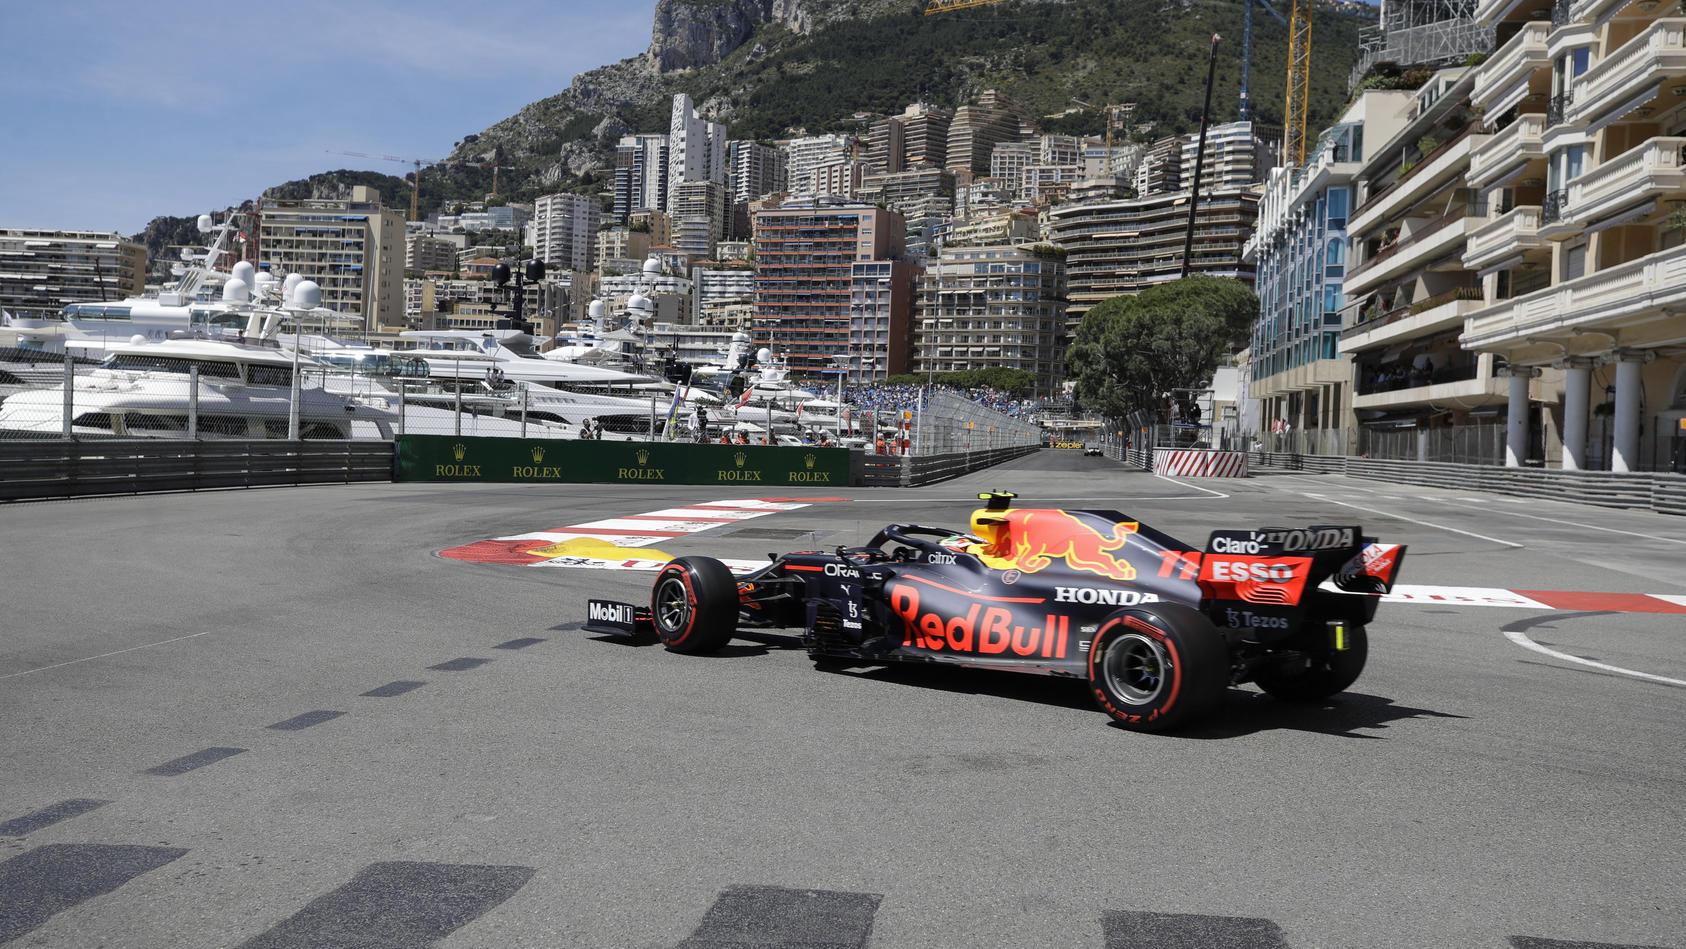 Fährt die Formel 1 künftig freitags in Monaco?